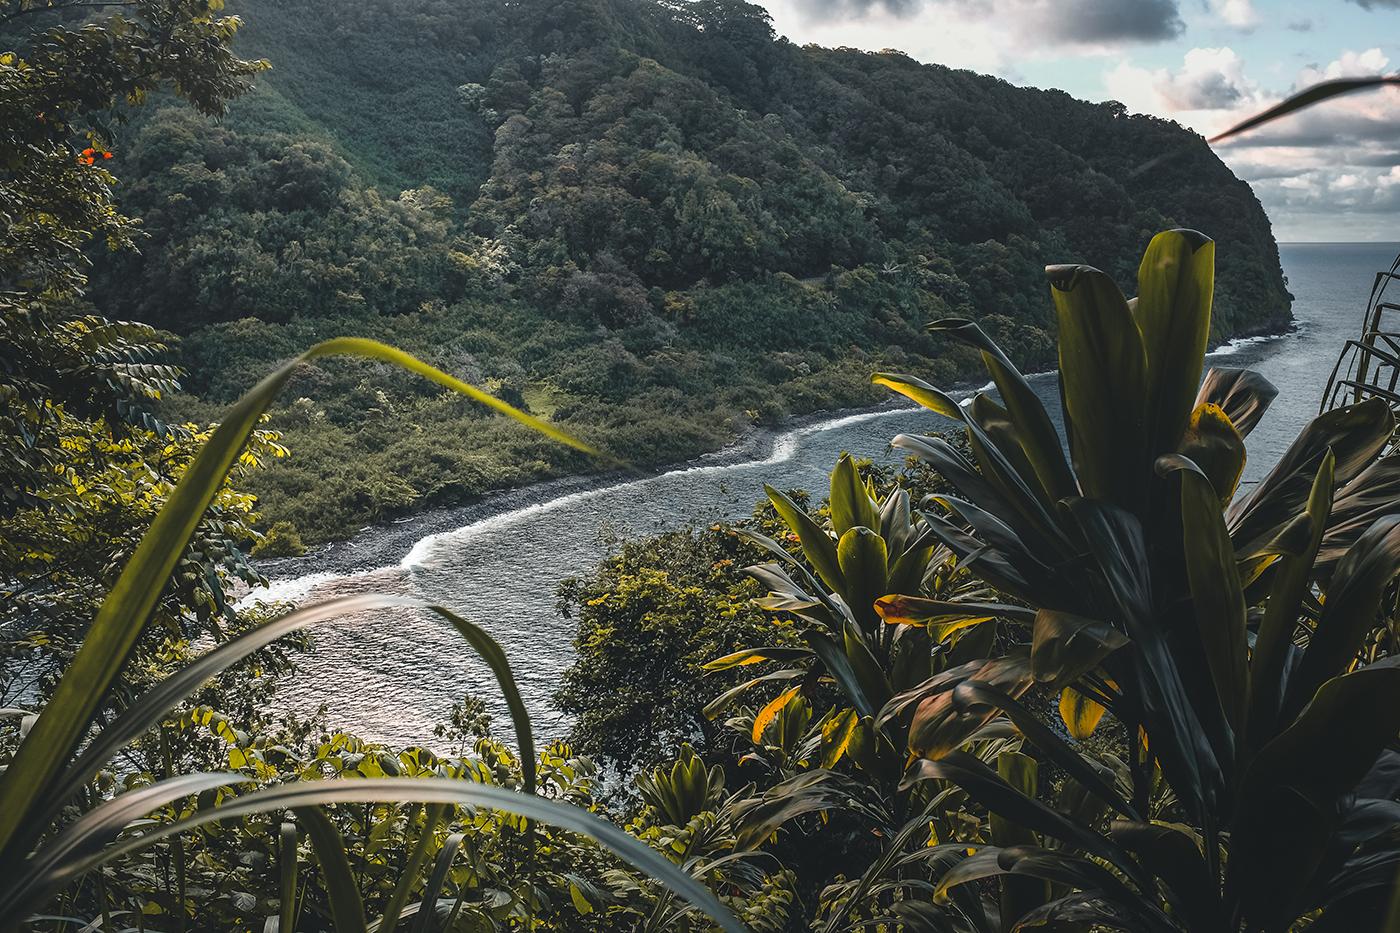 angie goes exploring honeymoon in 2½ itinerario di un mese in alaska e alle hawaii giorgia romiti maui road to hana